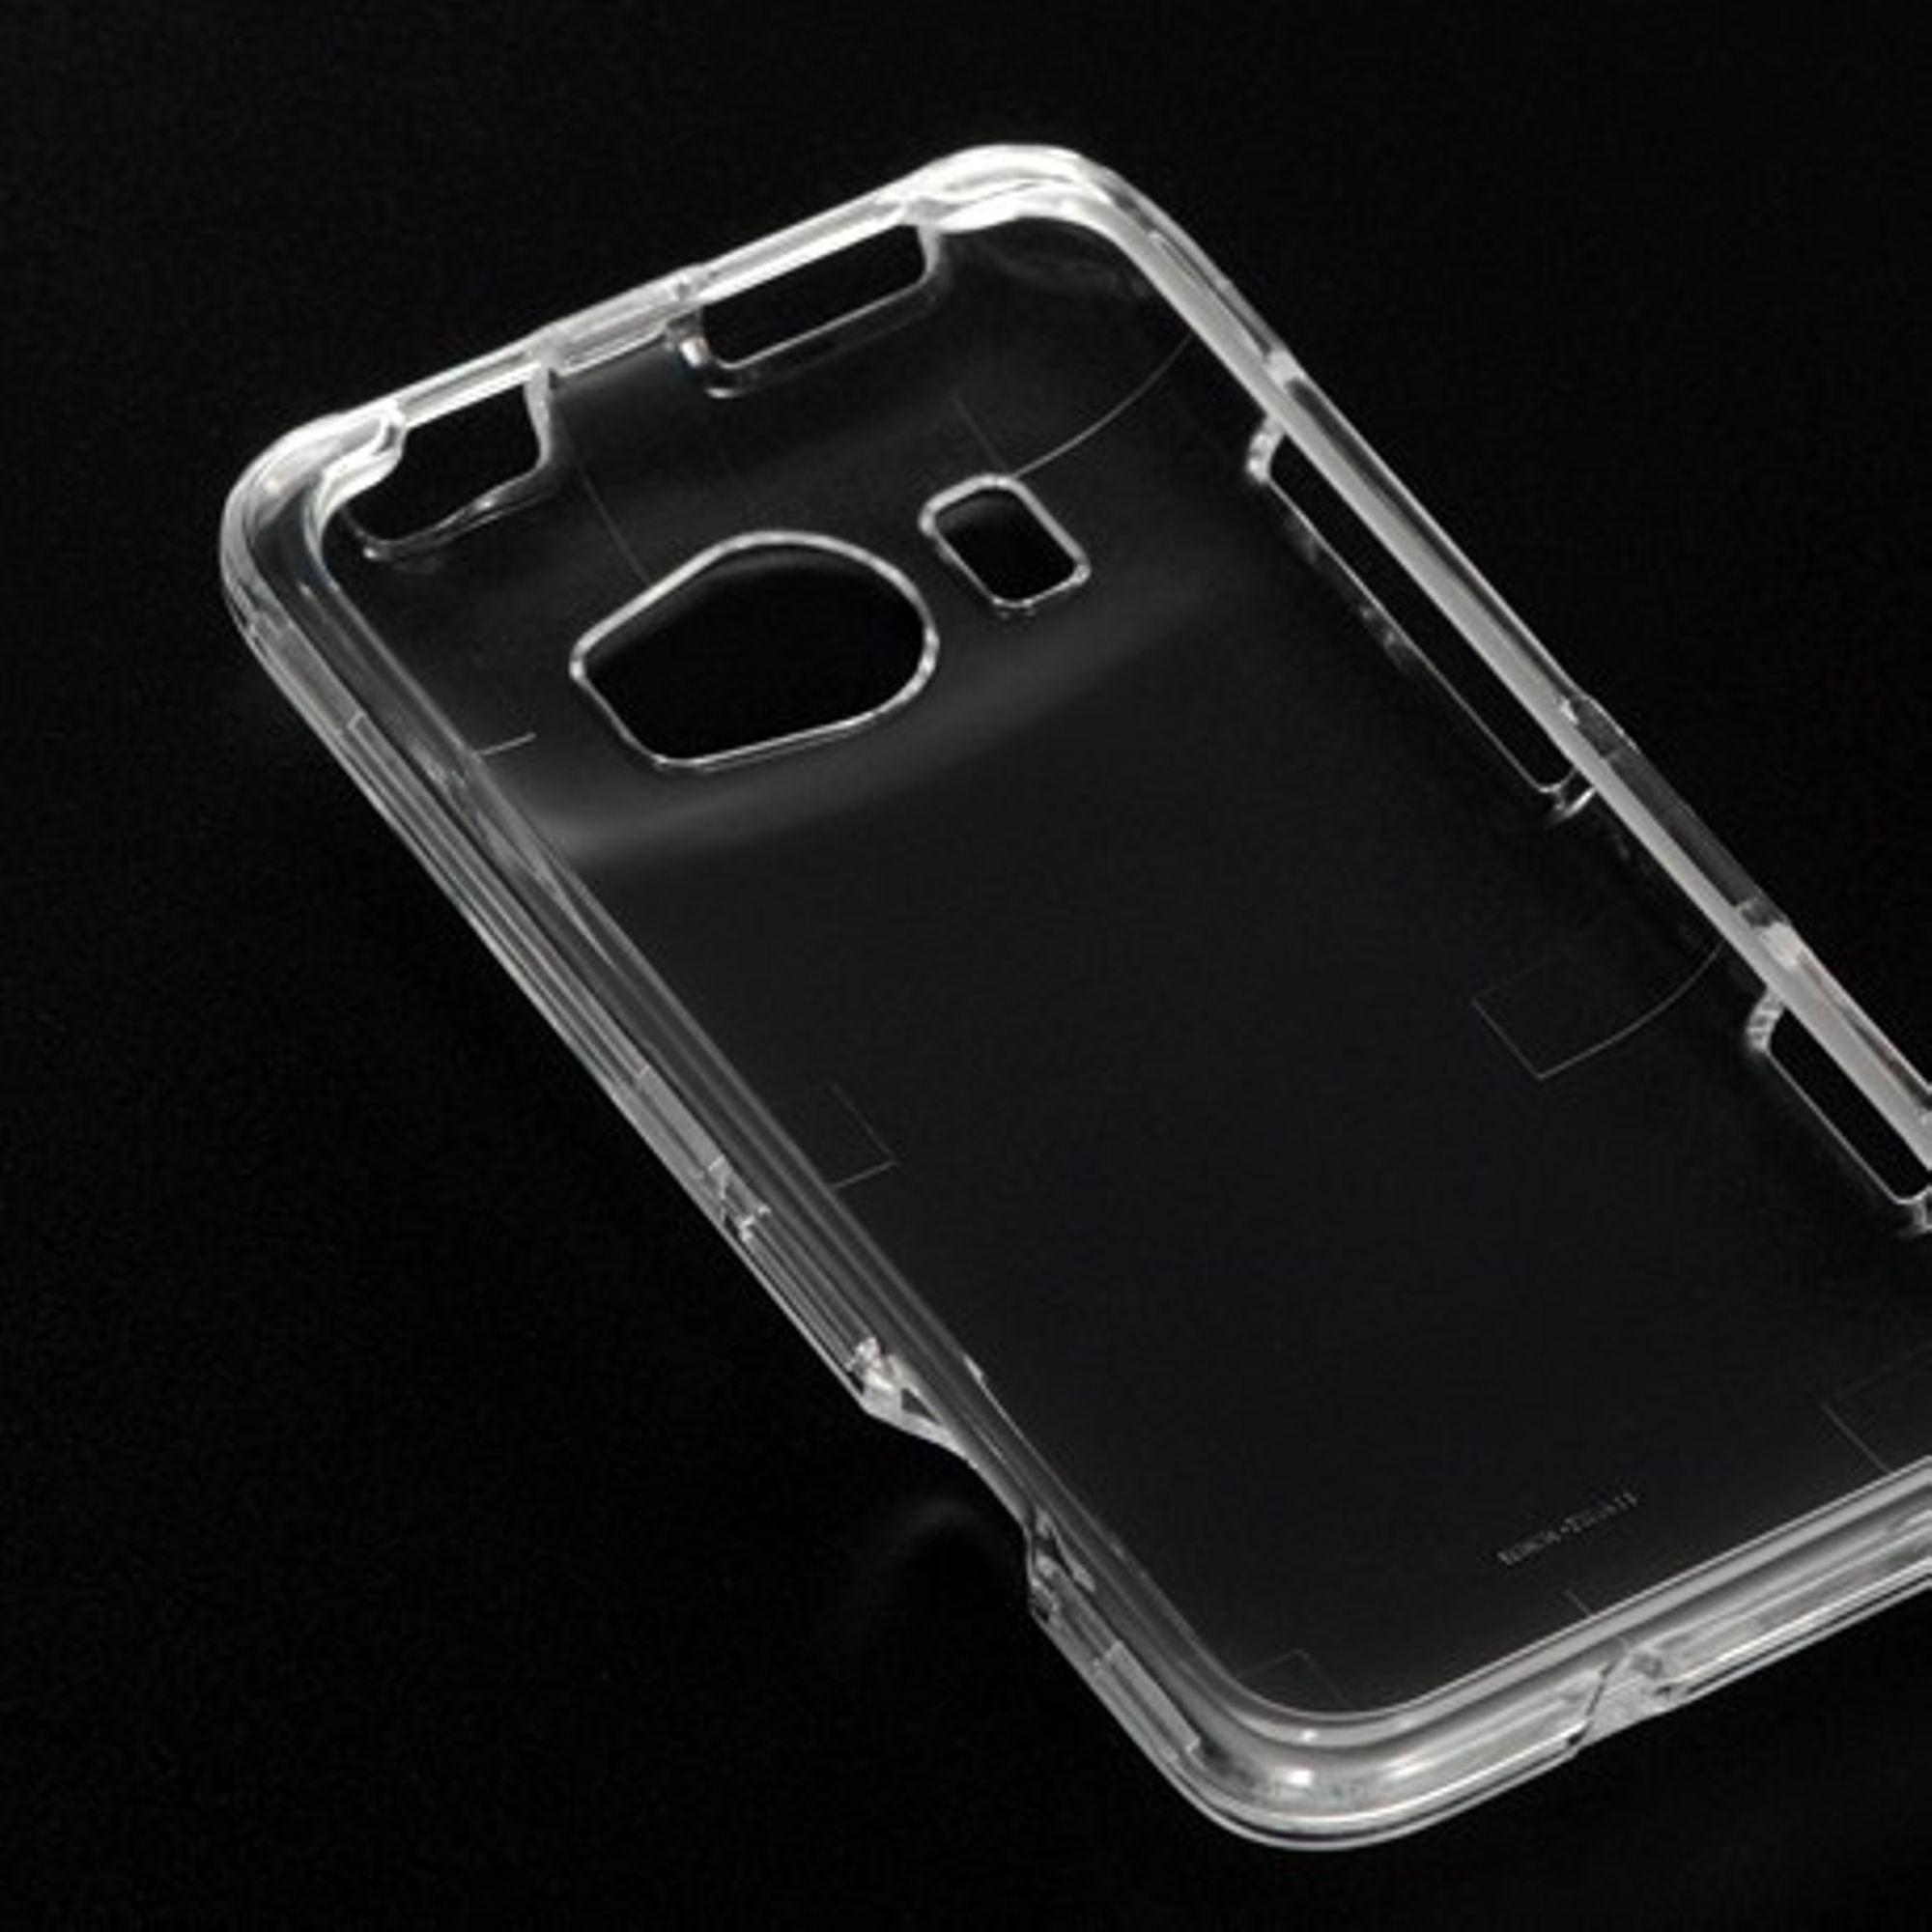 Insten Hard Plastic Case For HTC Titan II - Clear